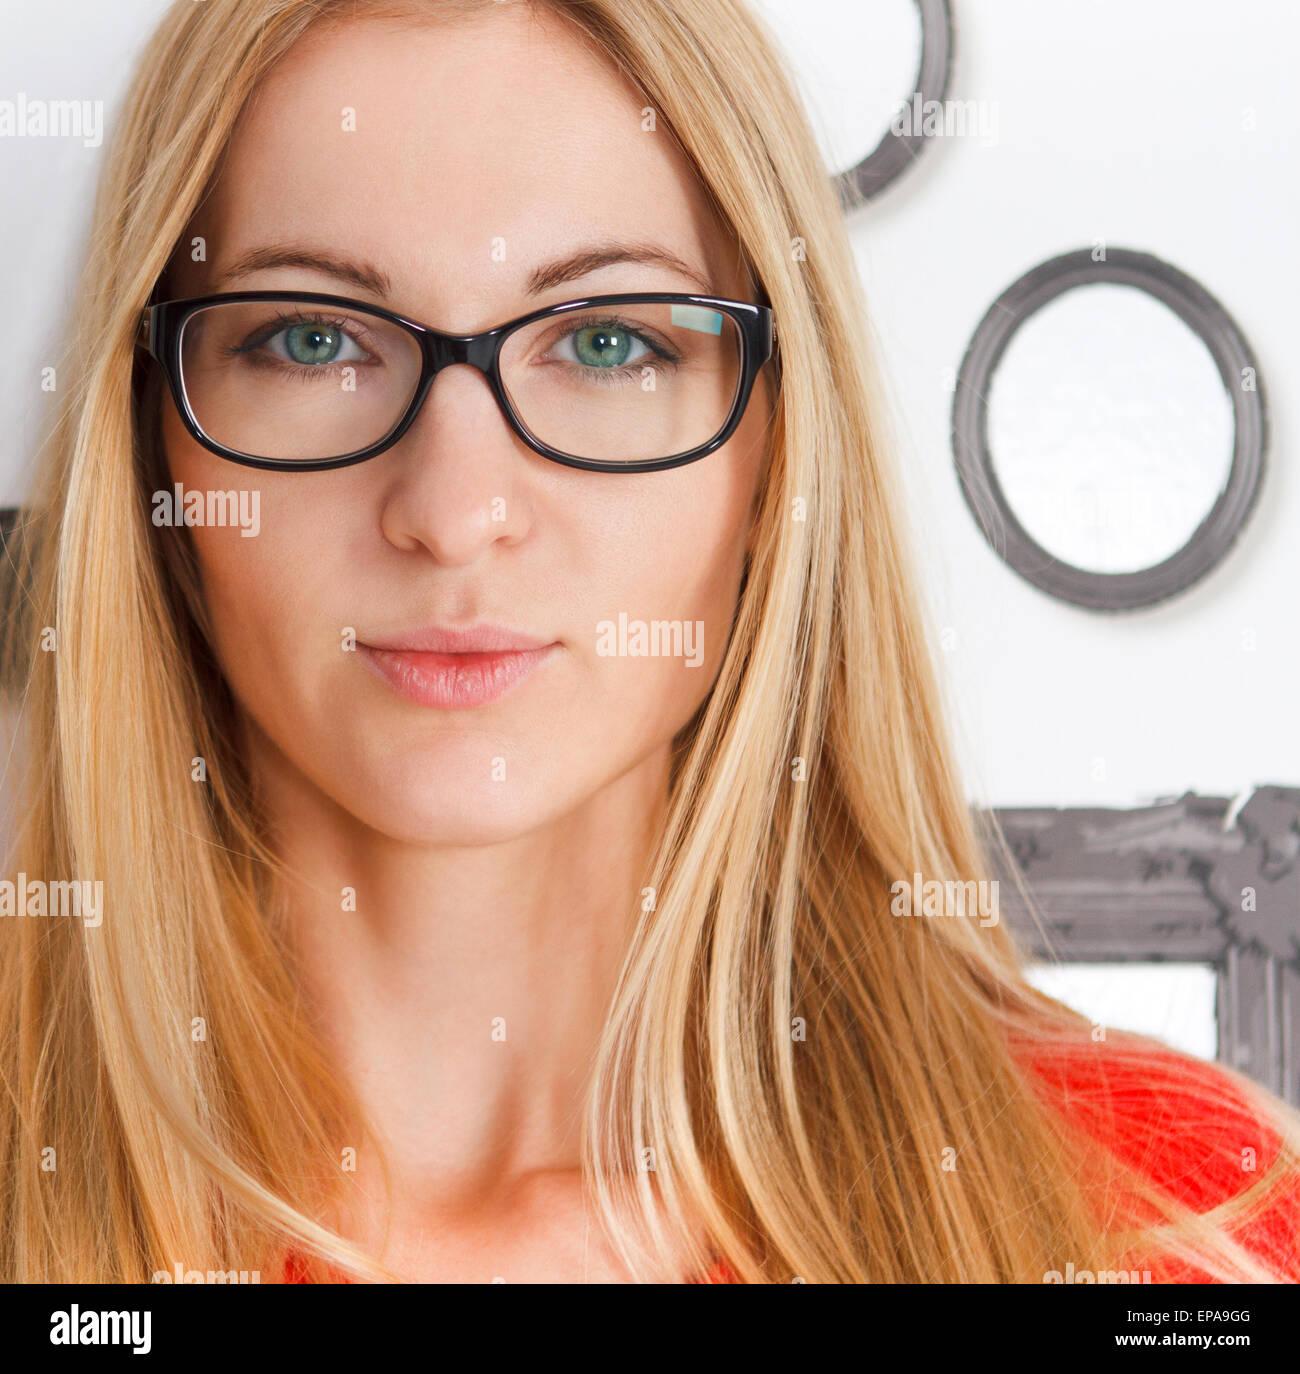 Portrait of the woman wearing black eye glasses - Stock Image